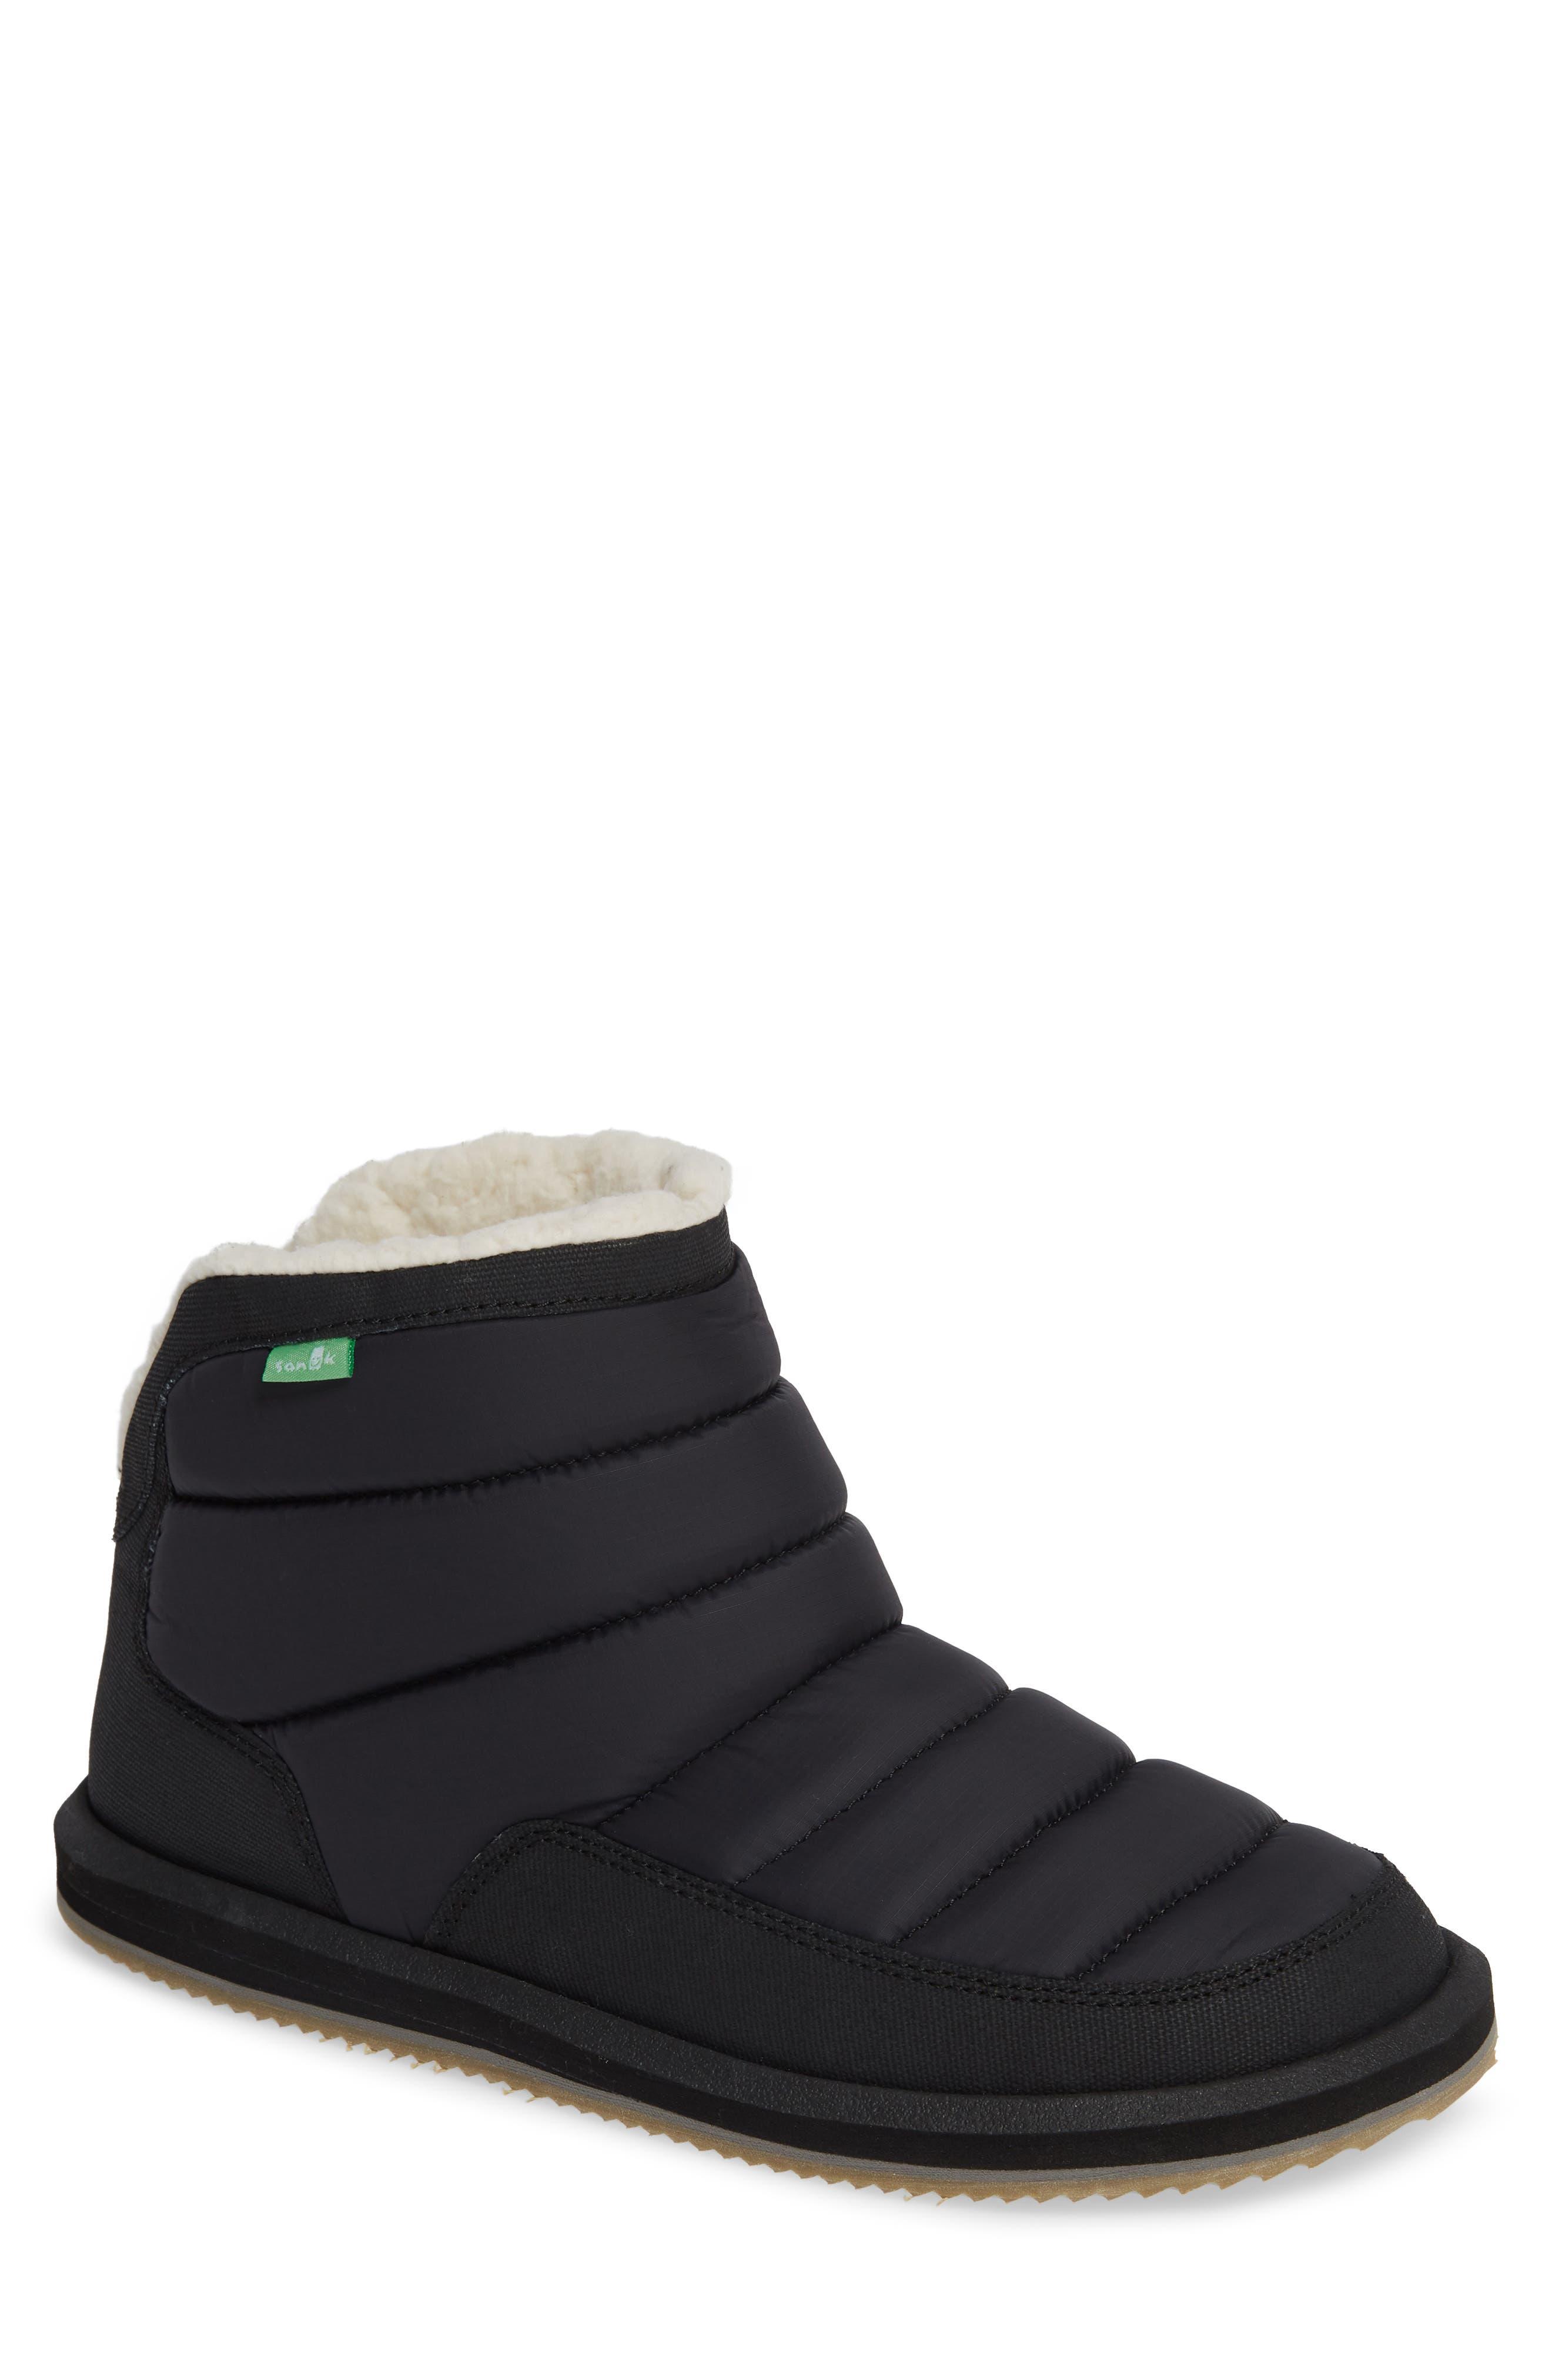 Sanuk Puff & Chill Weather Boot, Black